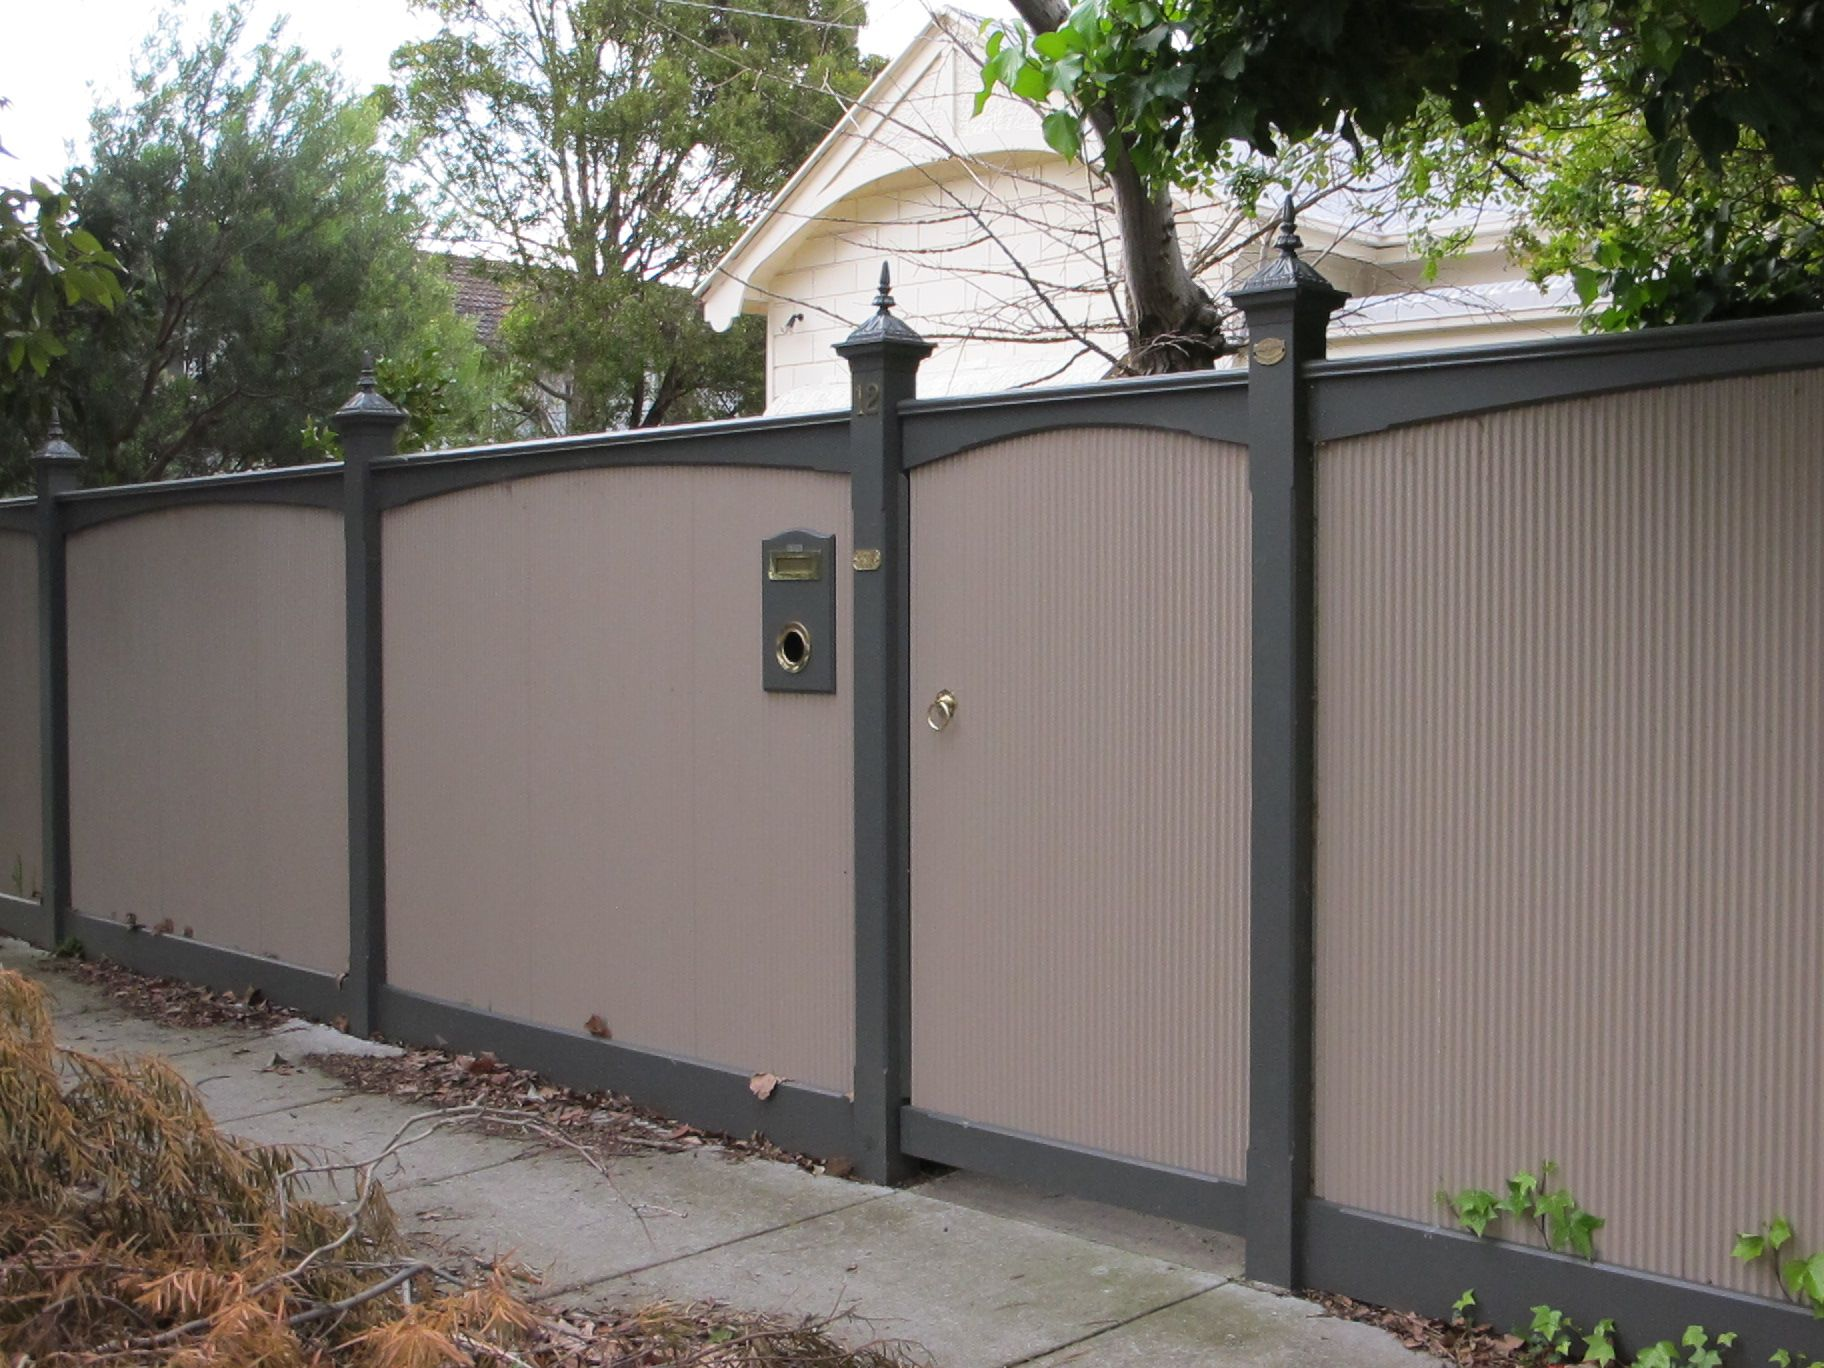 Download Solidaria Garden In 2020 Corrugated Metal Fence Fence Design Metal Fence